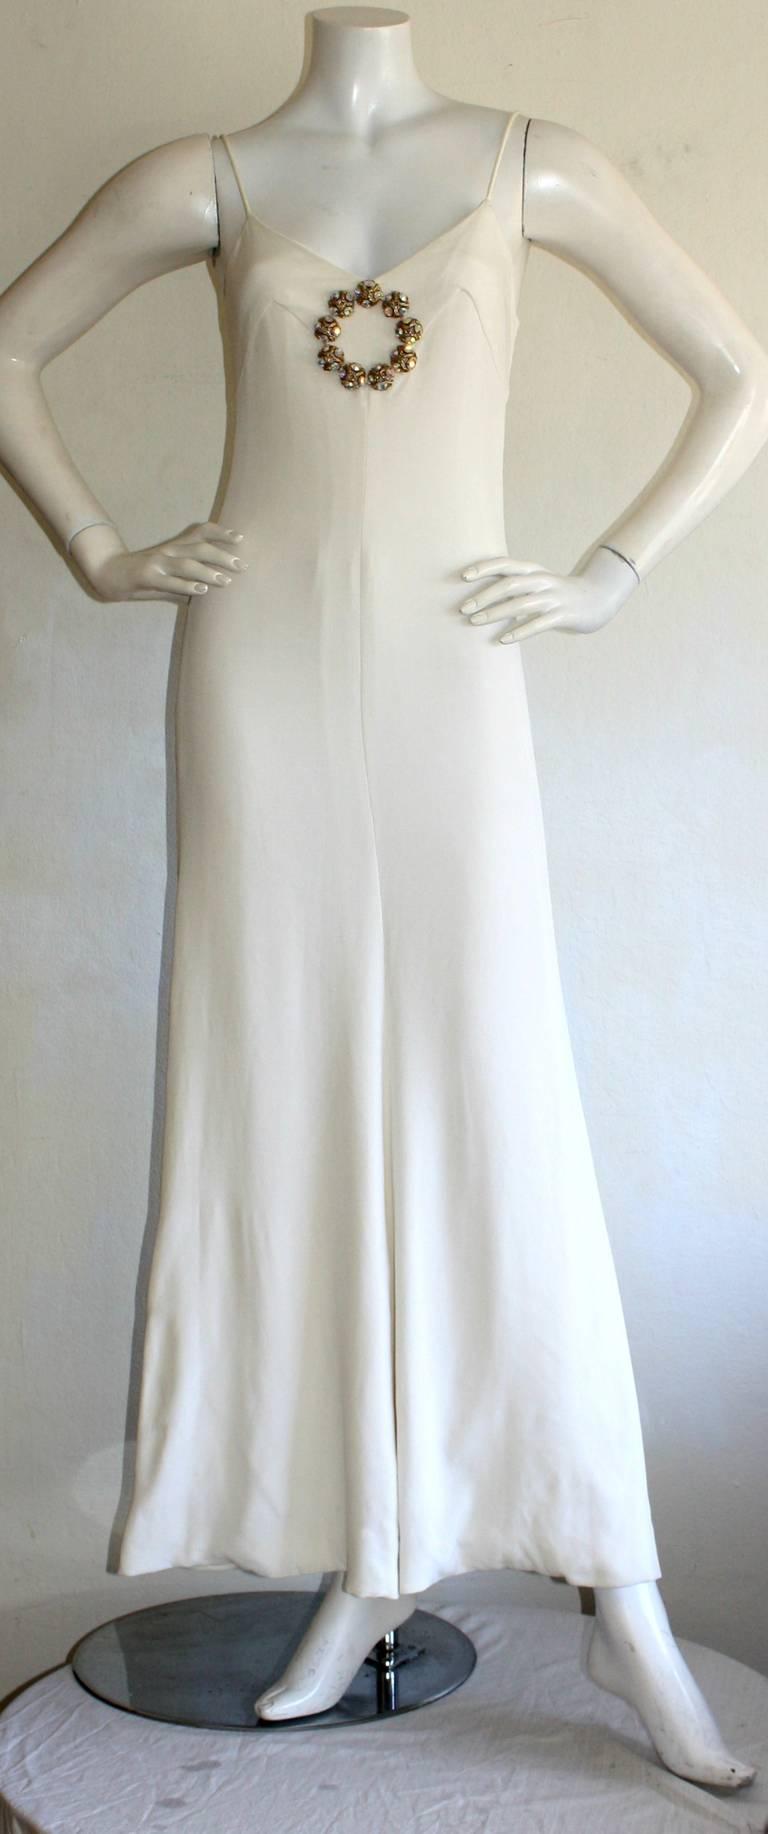 Beautiful 1970s Vintage Oscar de la Renta White Jewel Gown Perfect Wedding Dress 2